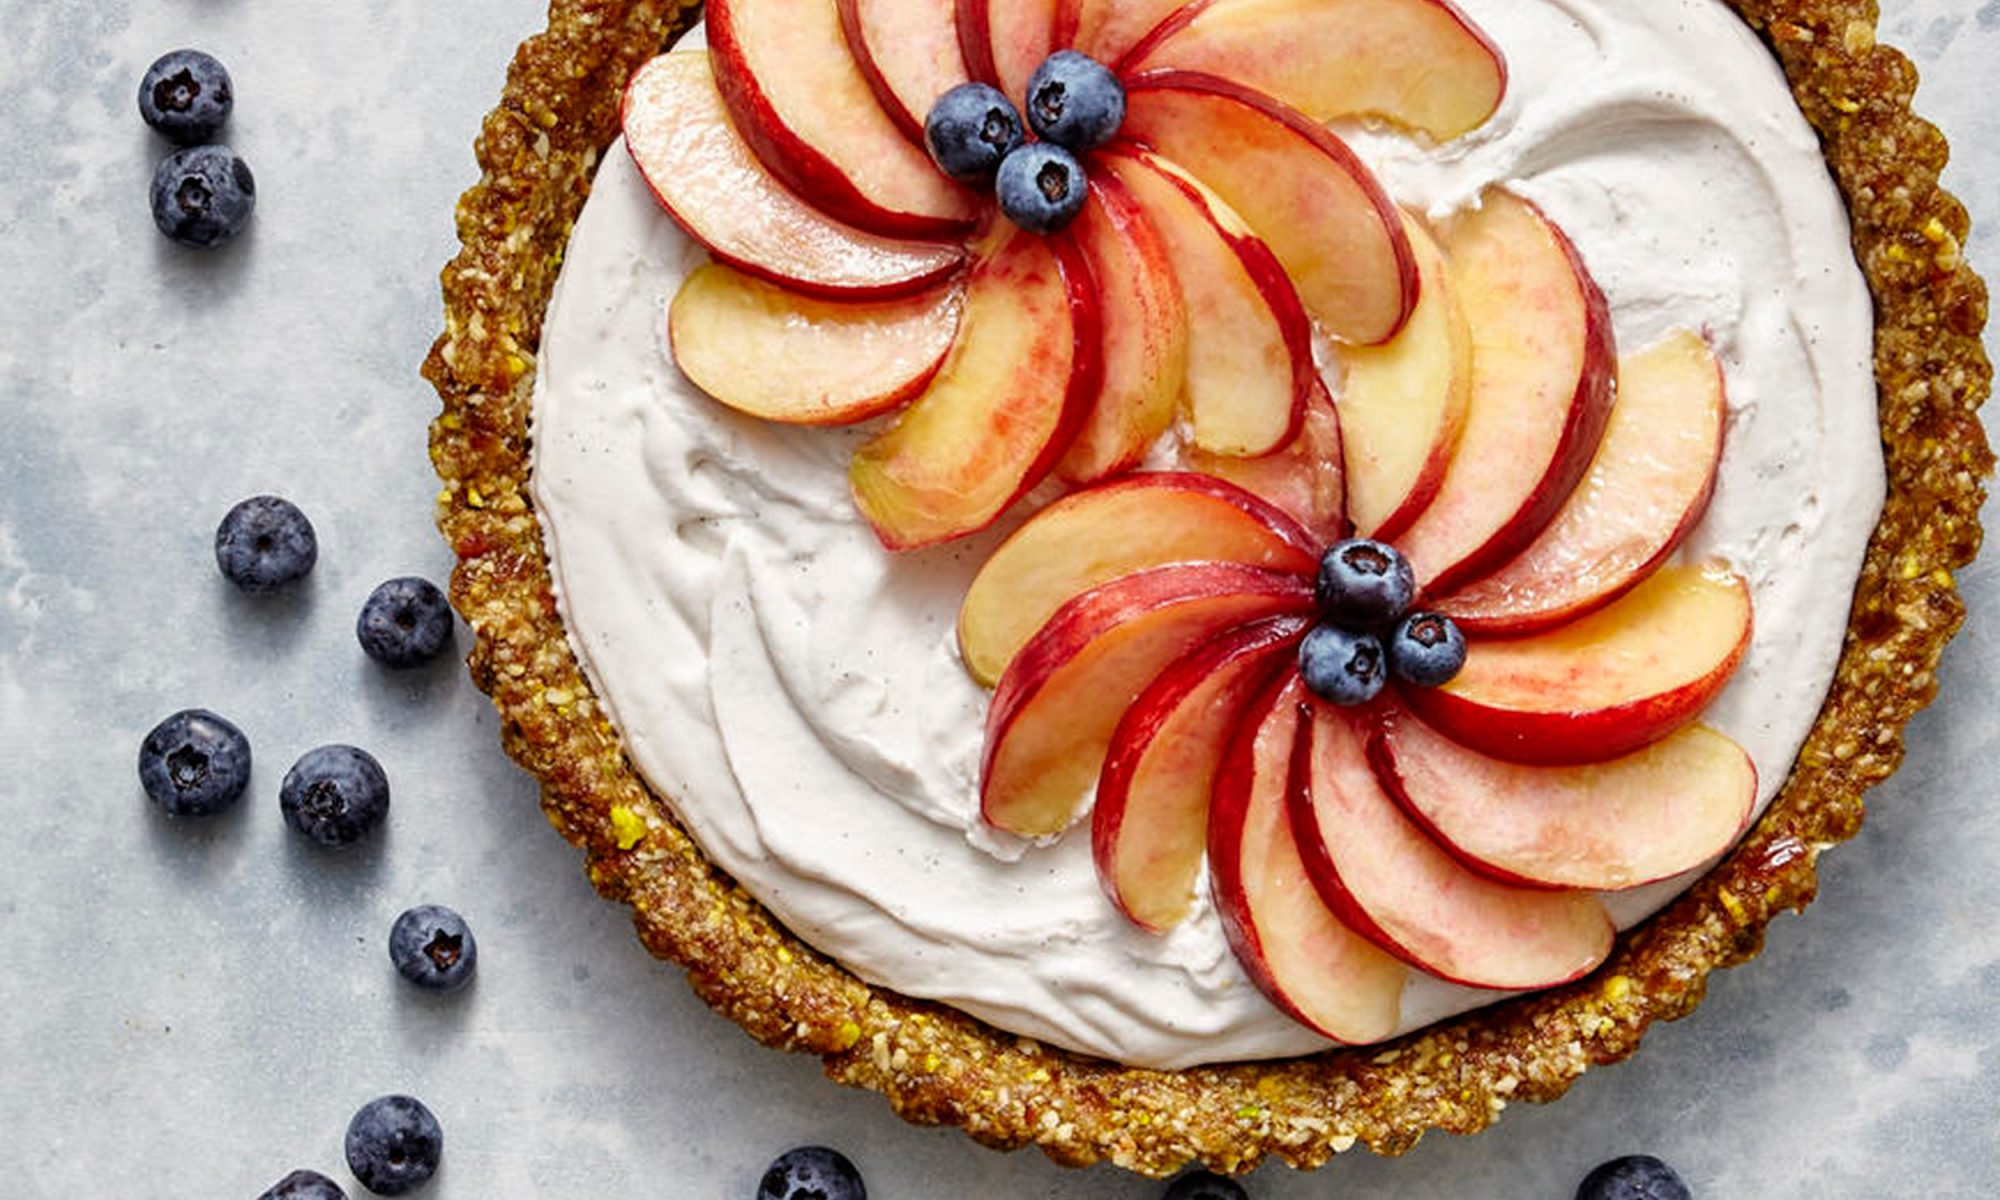 Vegan Coconut Cream Tart with White Peaches and Blueberries